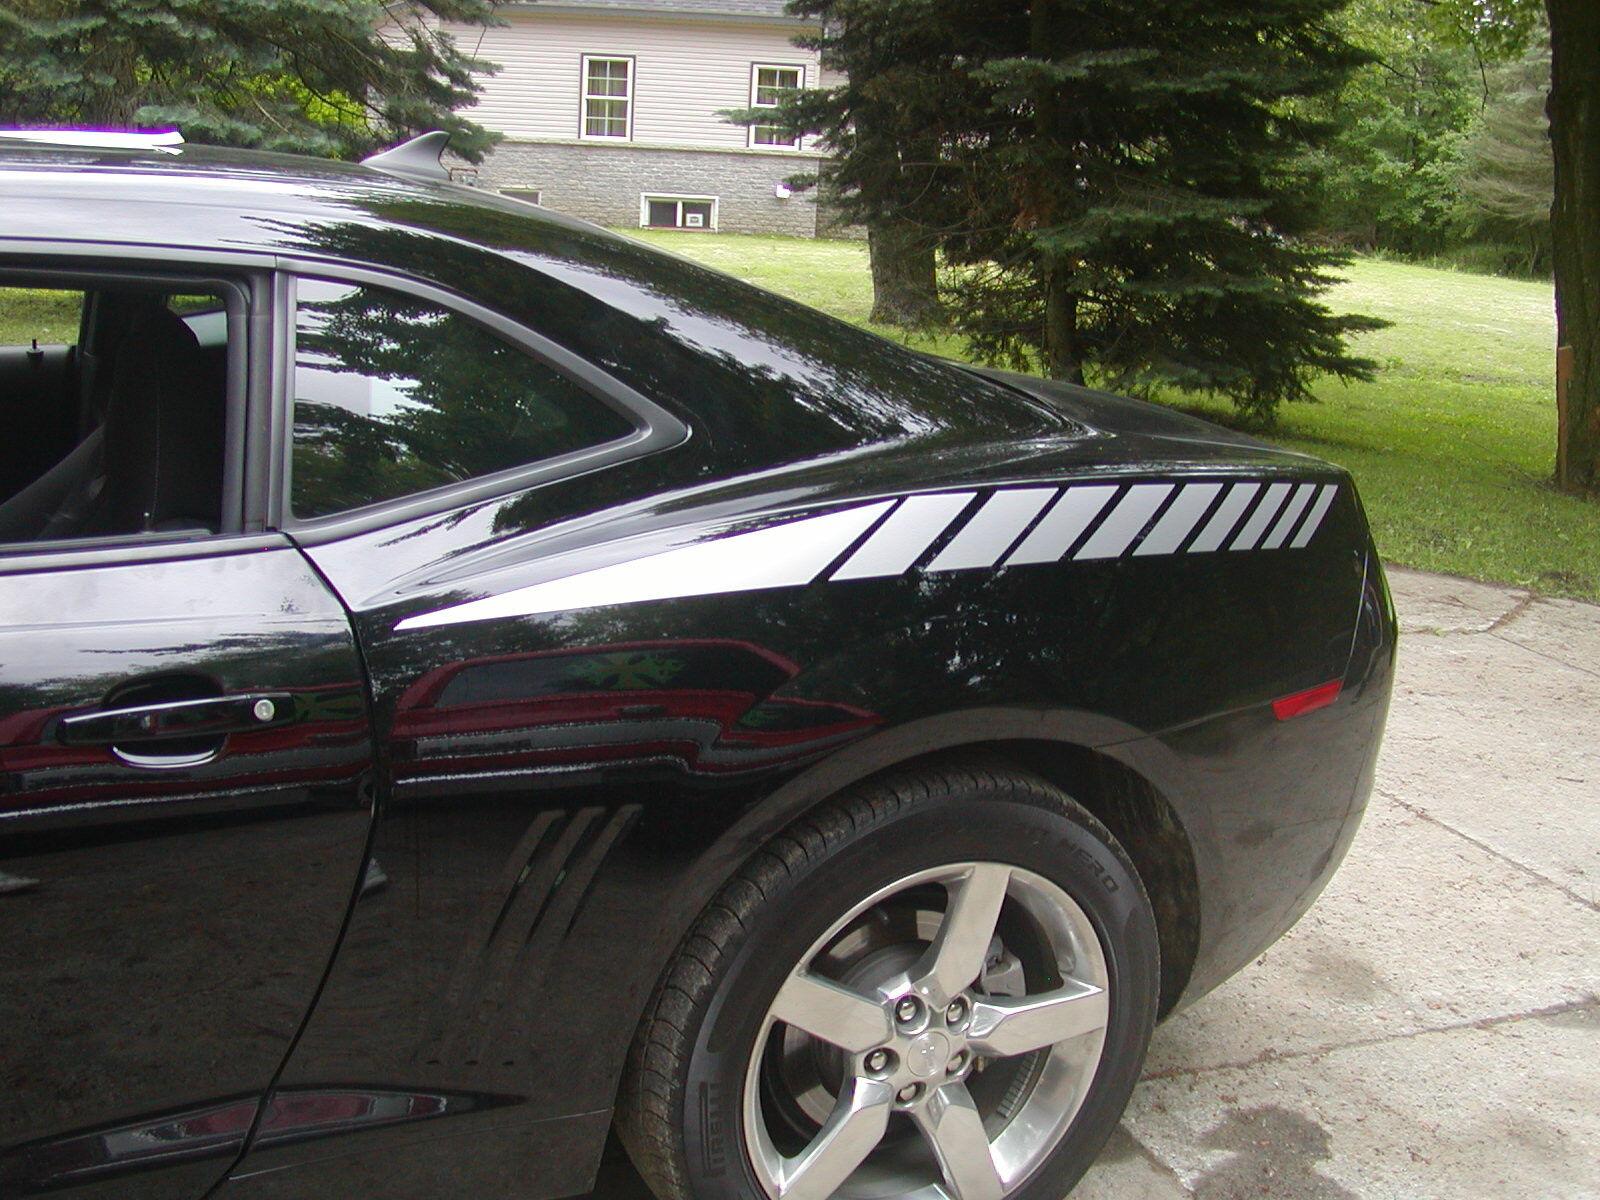 2010 2012 2013 14 2015 Camaro Faded Rear Quarter stripes Stripe Graphics Decals